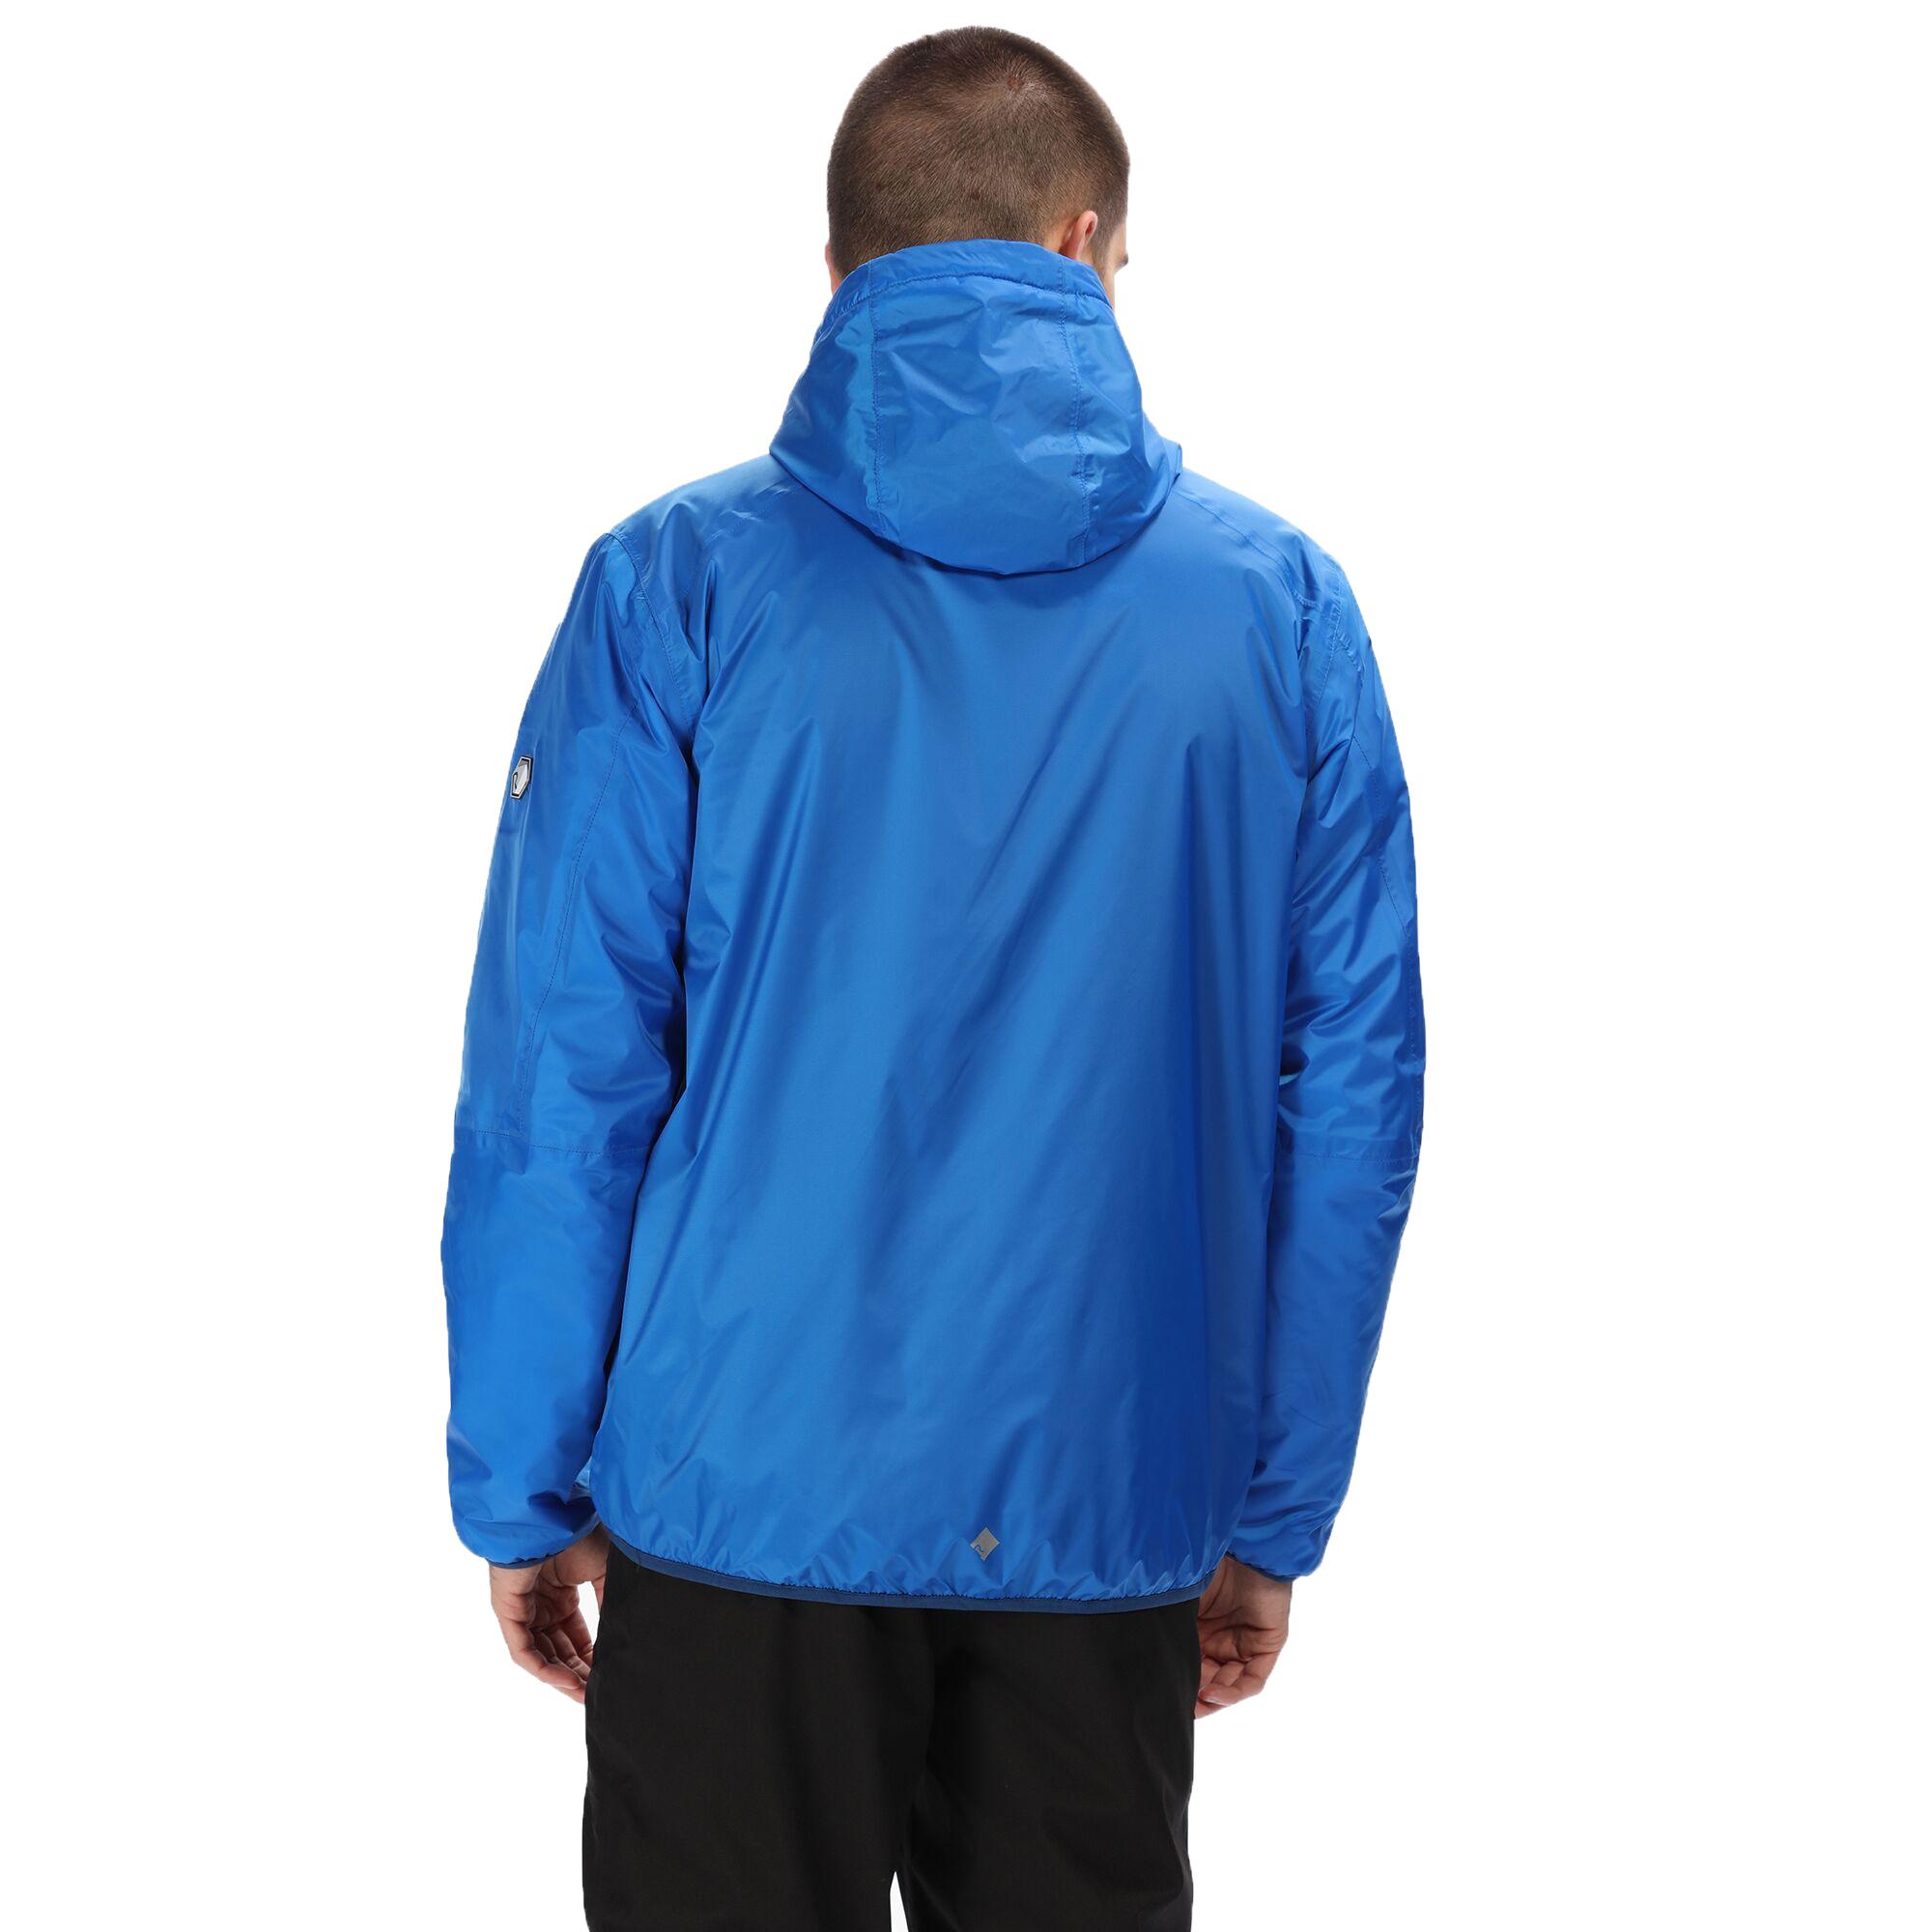 Regatta-Tarren-Mens-Wateproof-Breathable-Fleece-Lined-Jacket-RRP-70 thumbnail 7